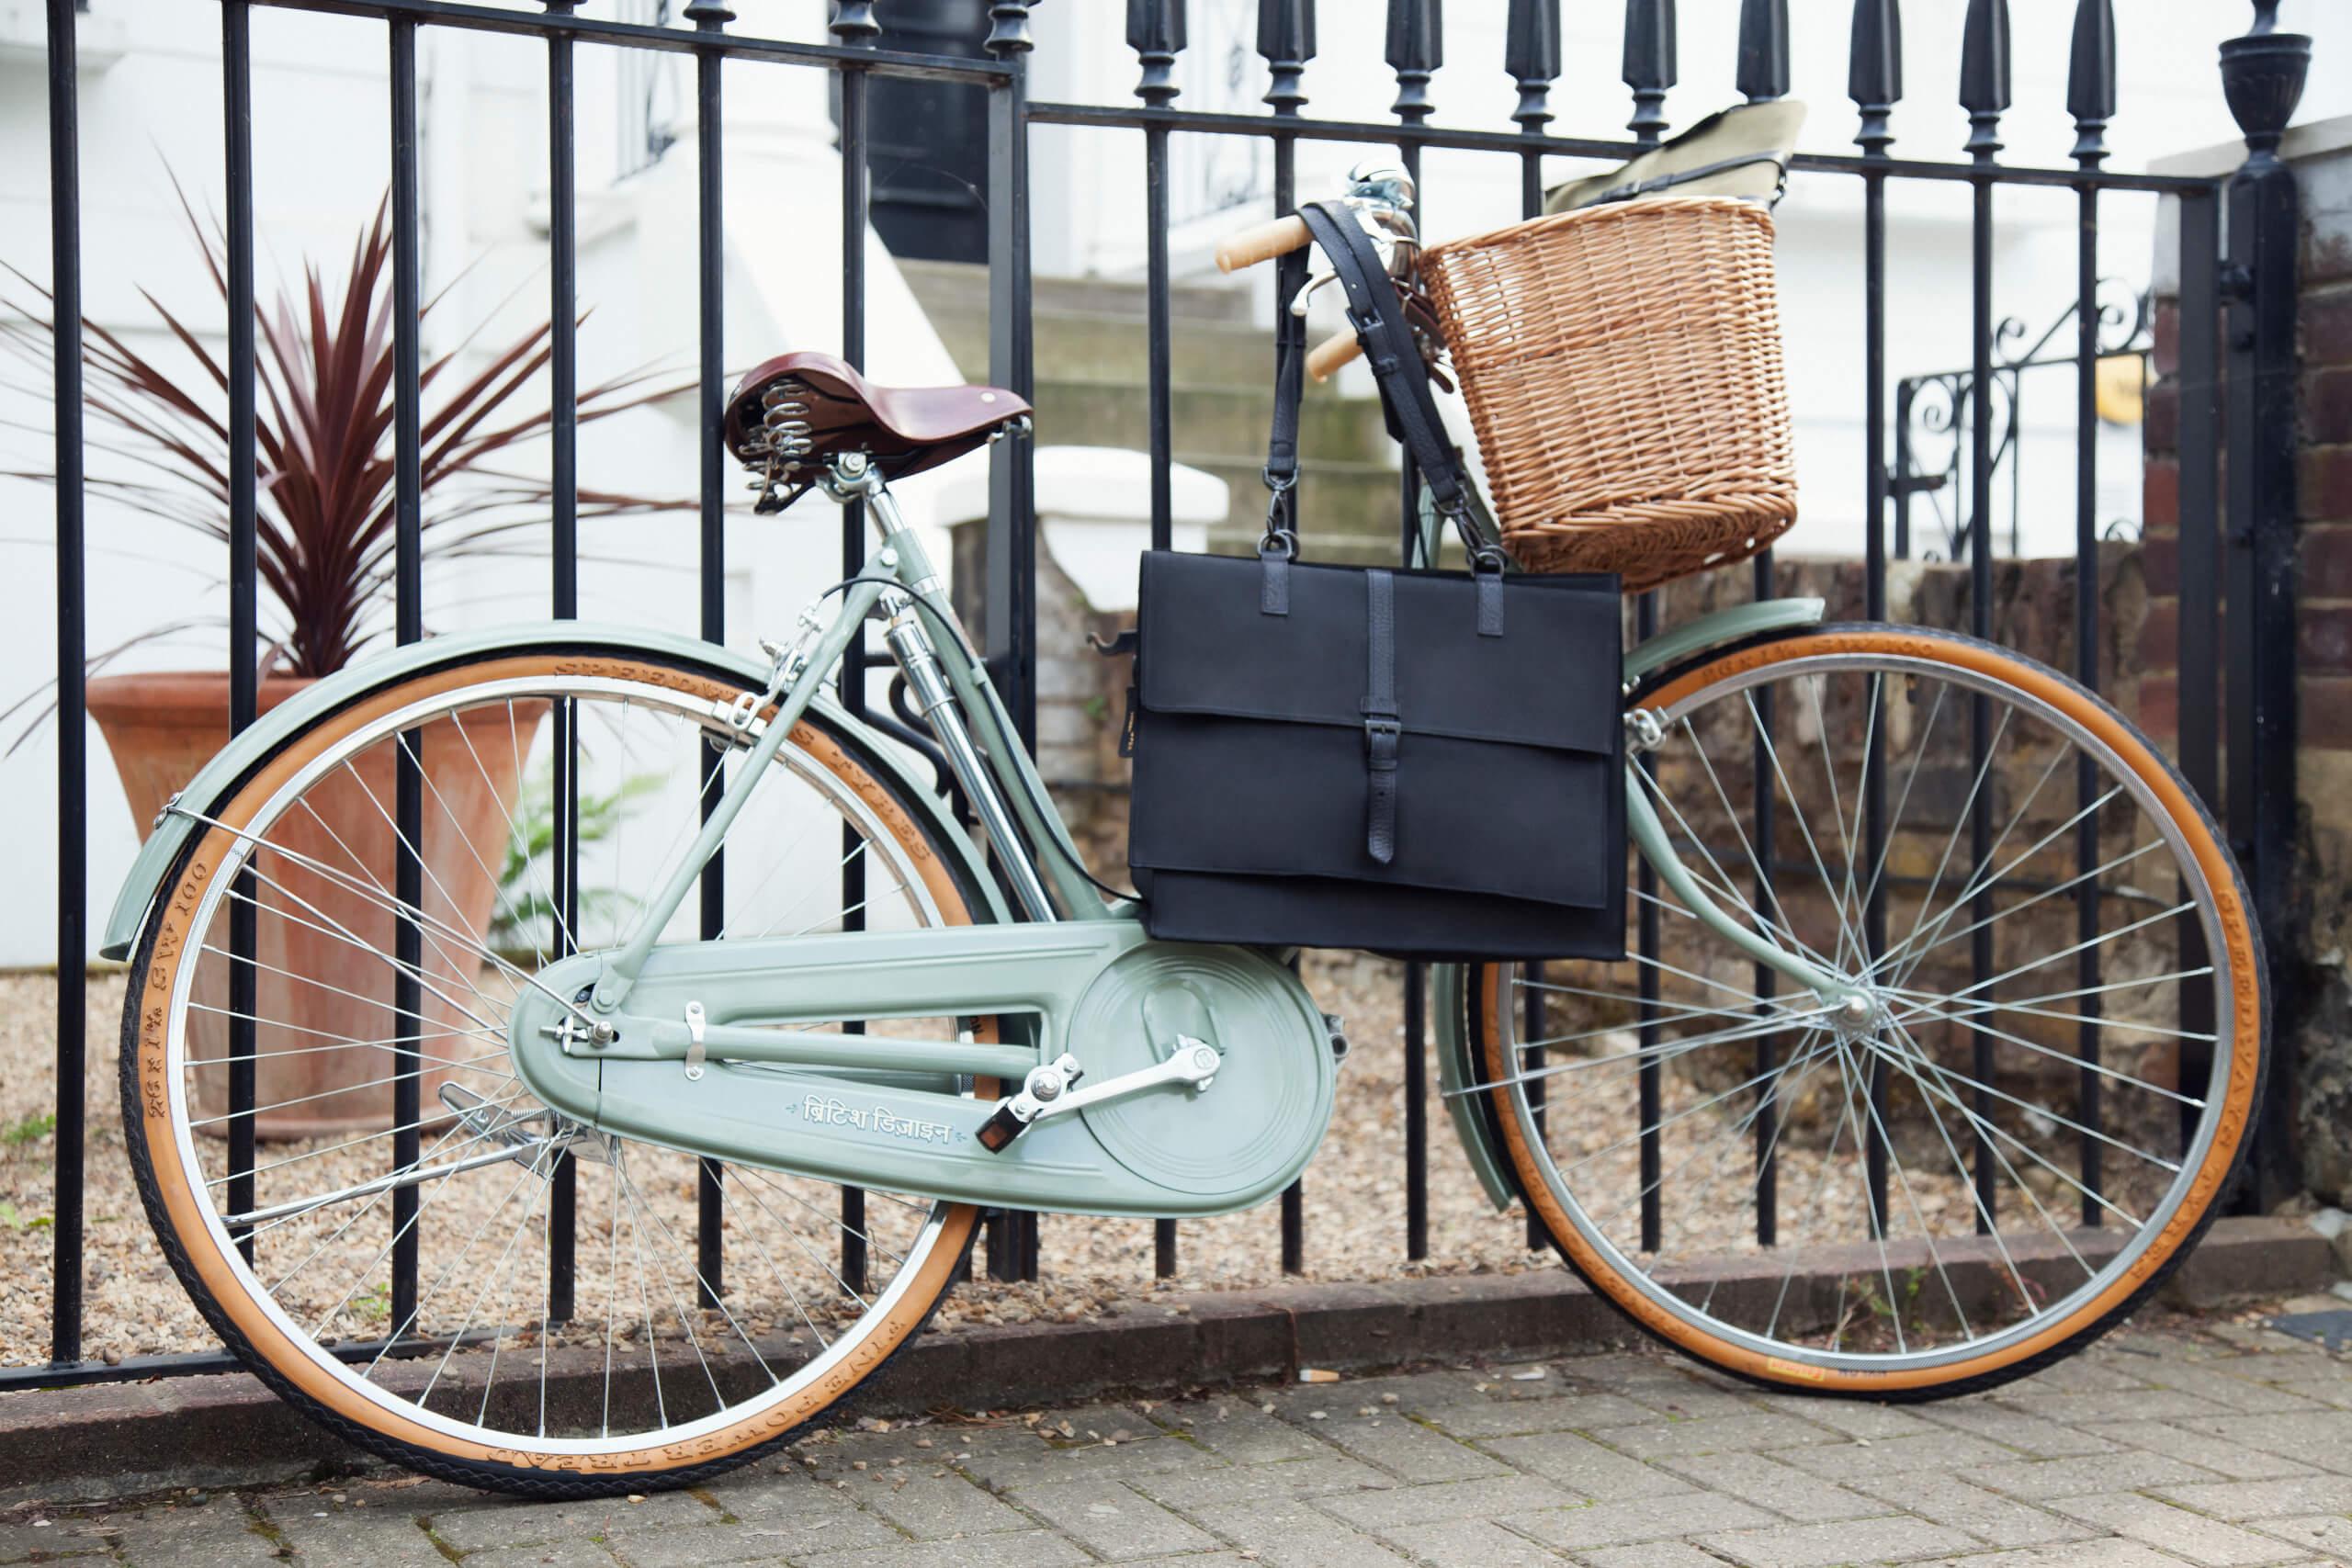 Olive Cooper, Satchel Bags, evening bags, handbags, designer handbags, handbag, handbags uk